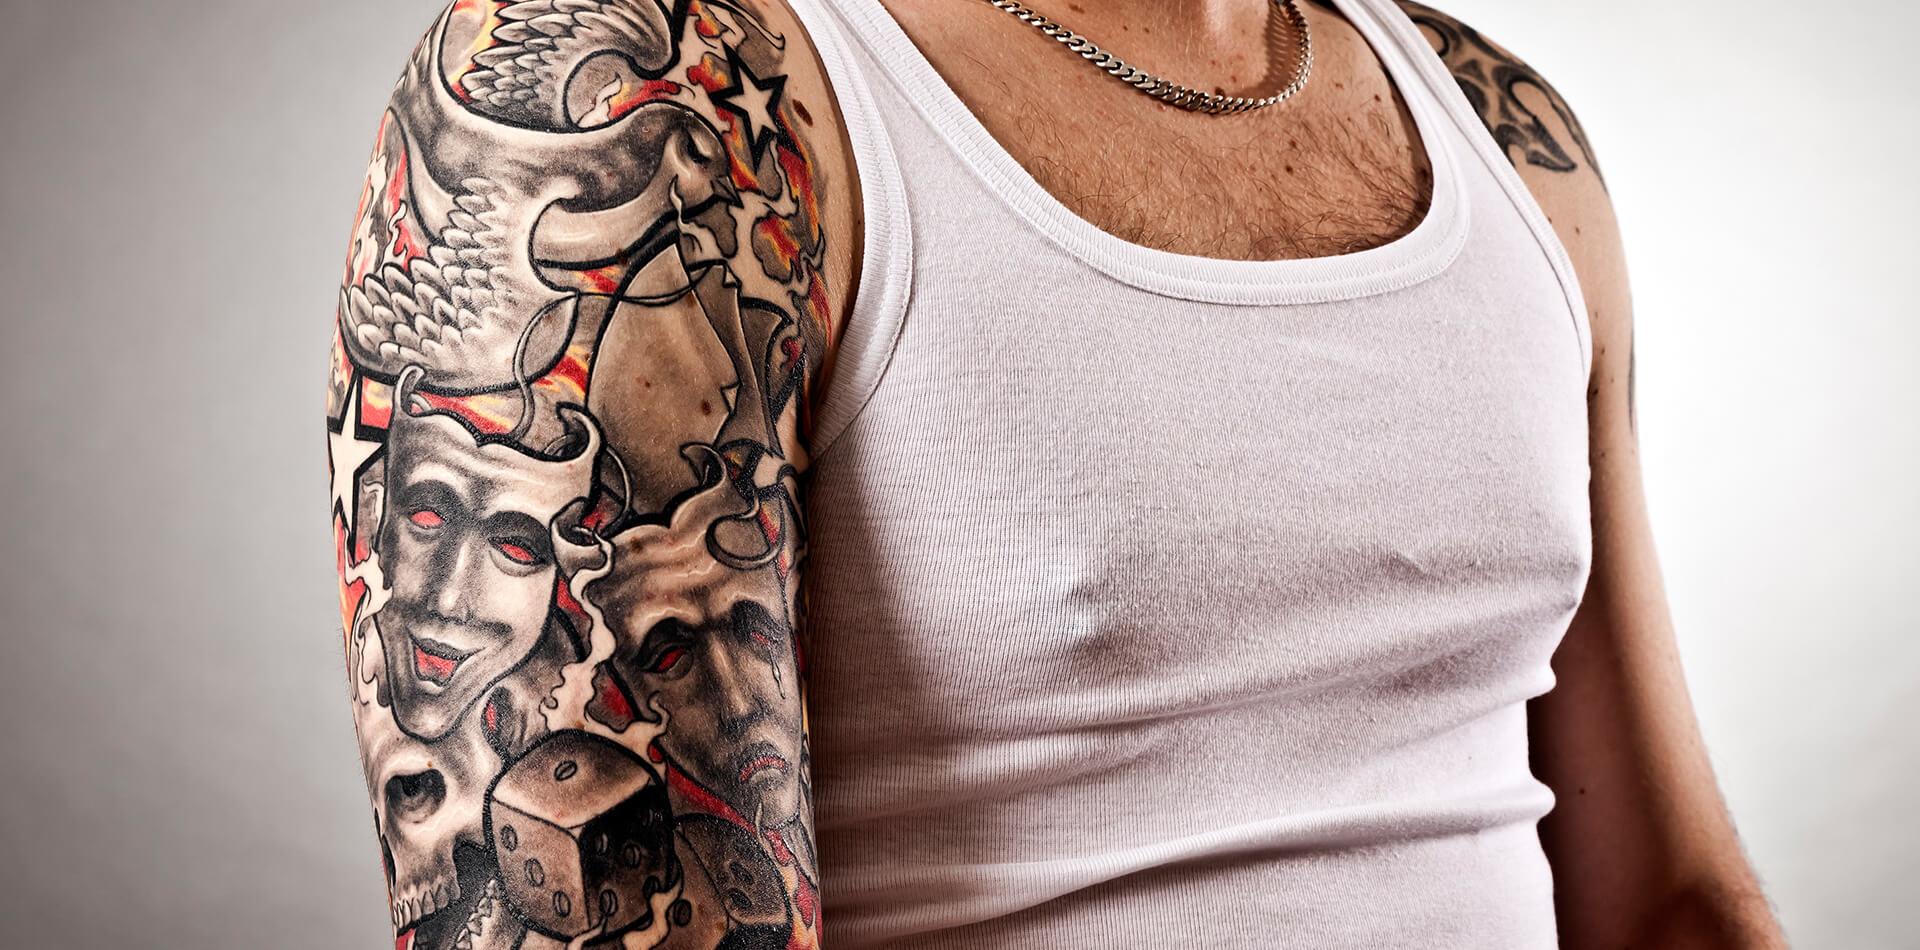 Intimate Tattoos